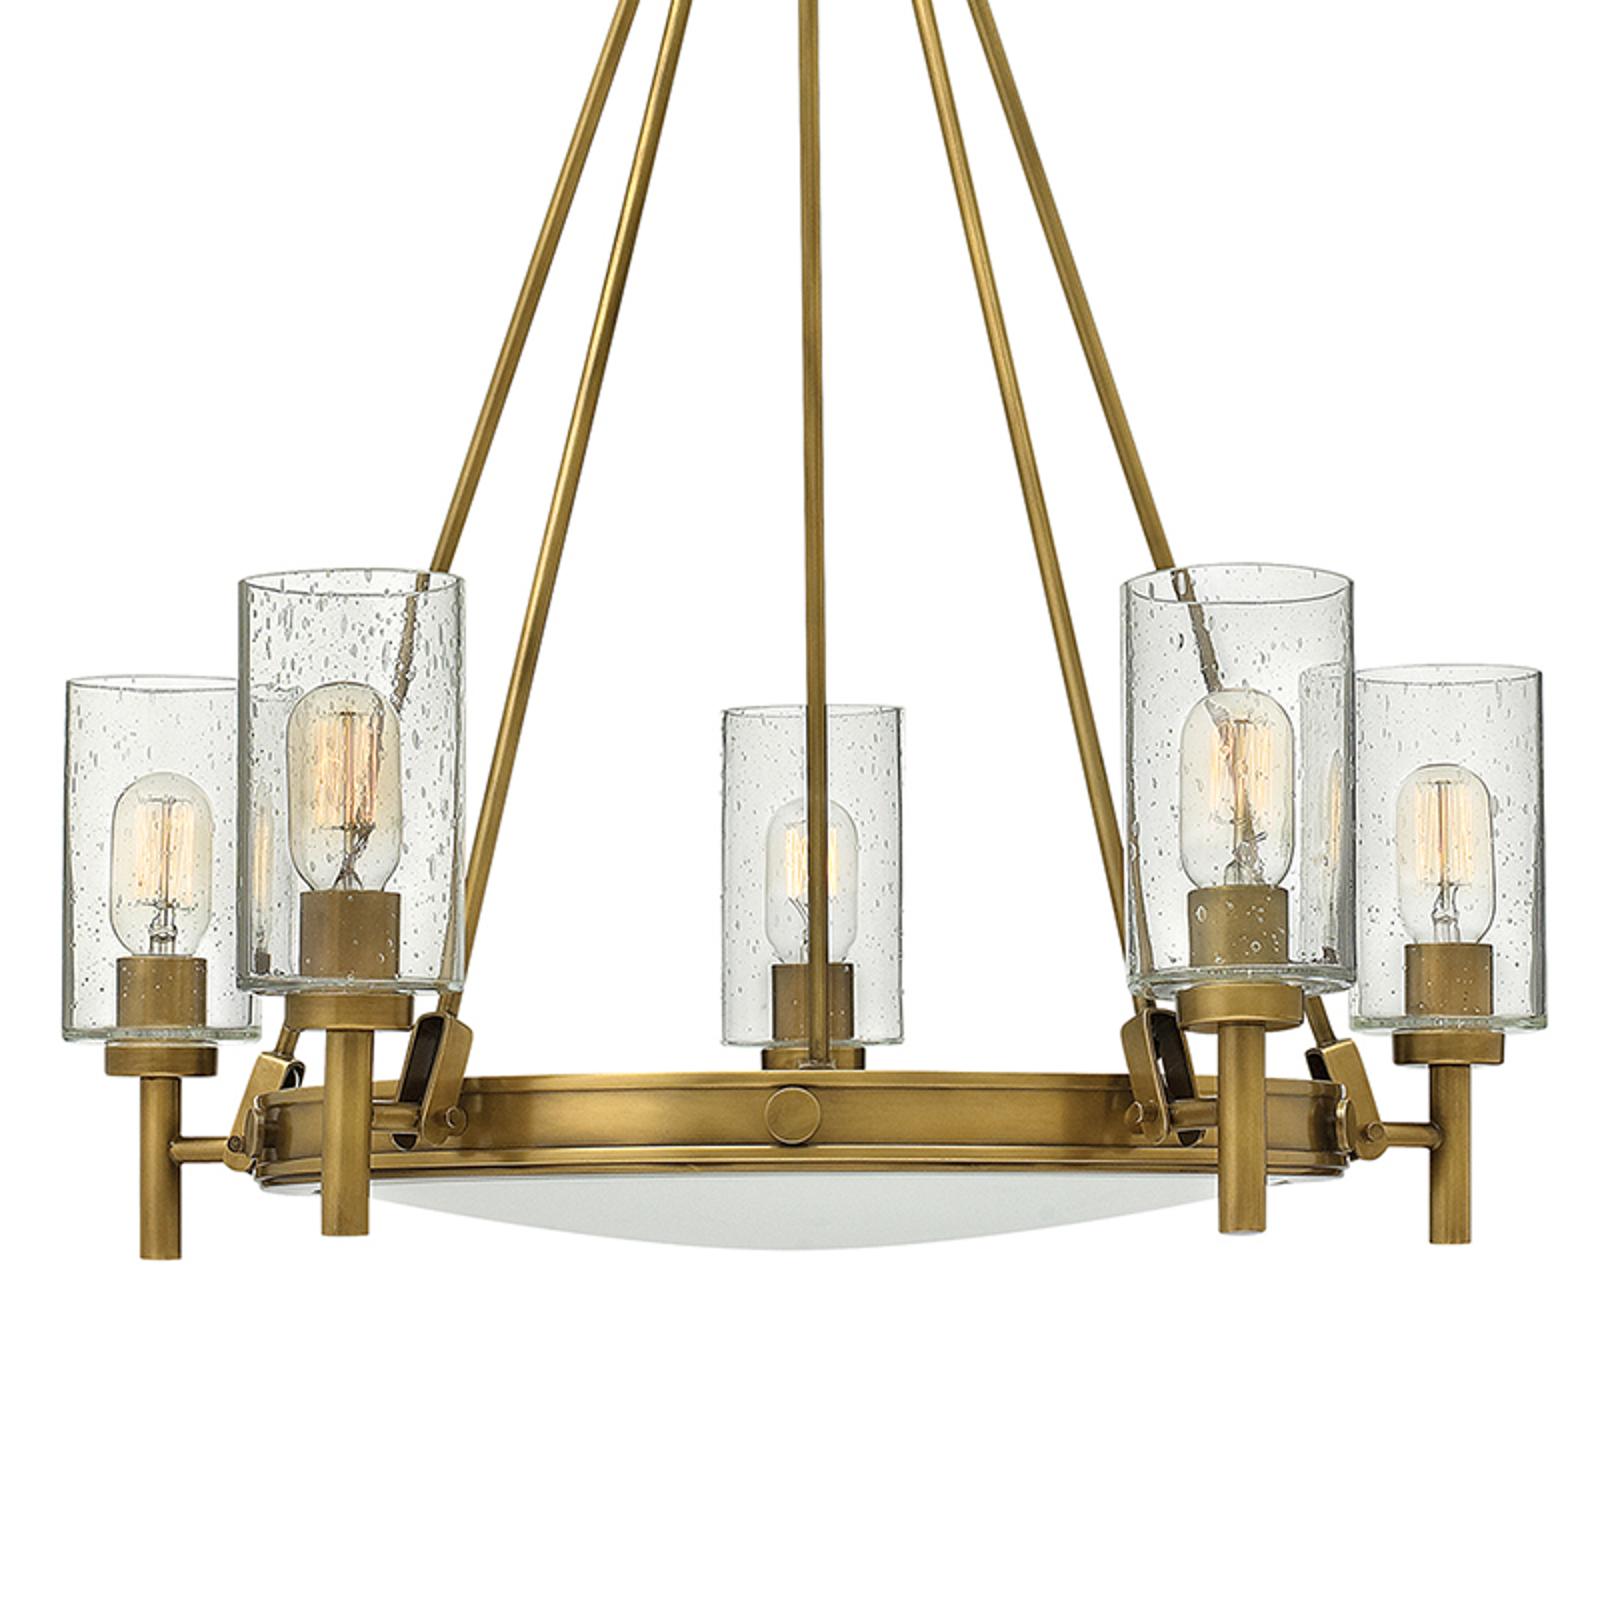 Fife-bulb Collier chandelier_3048437_1